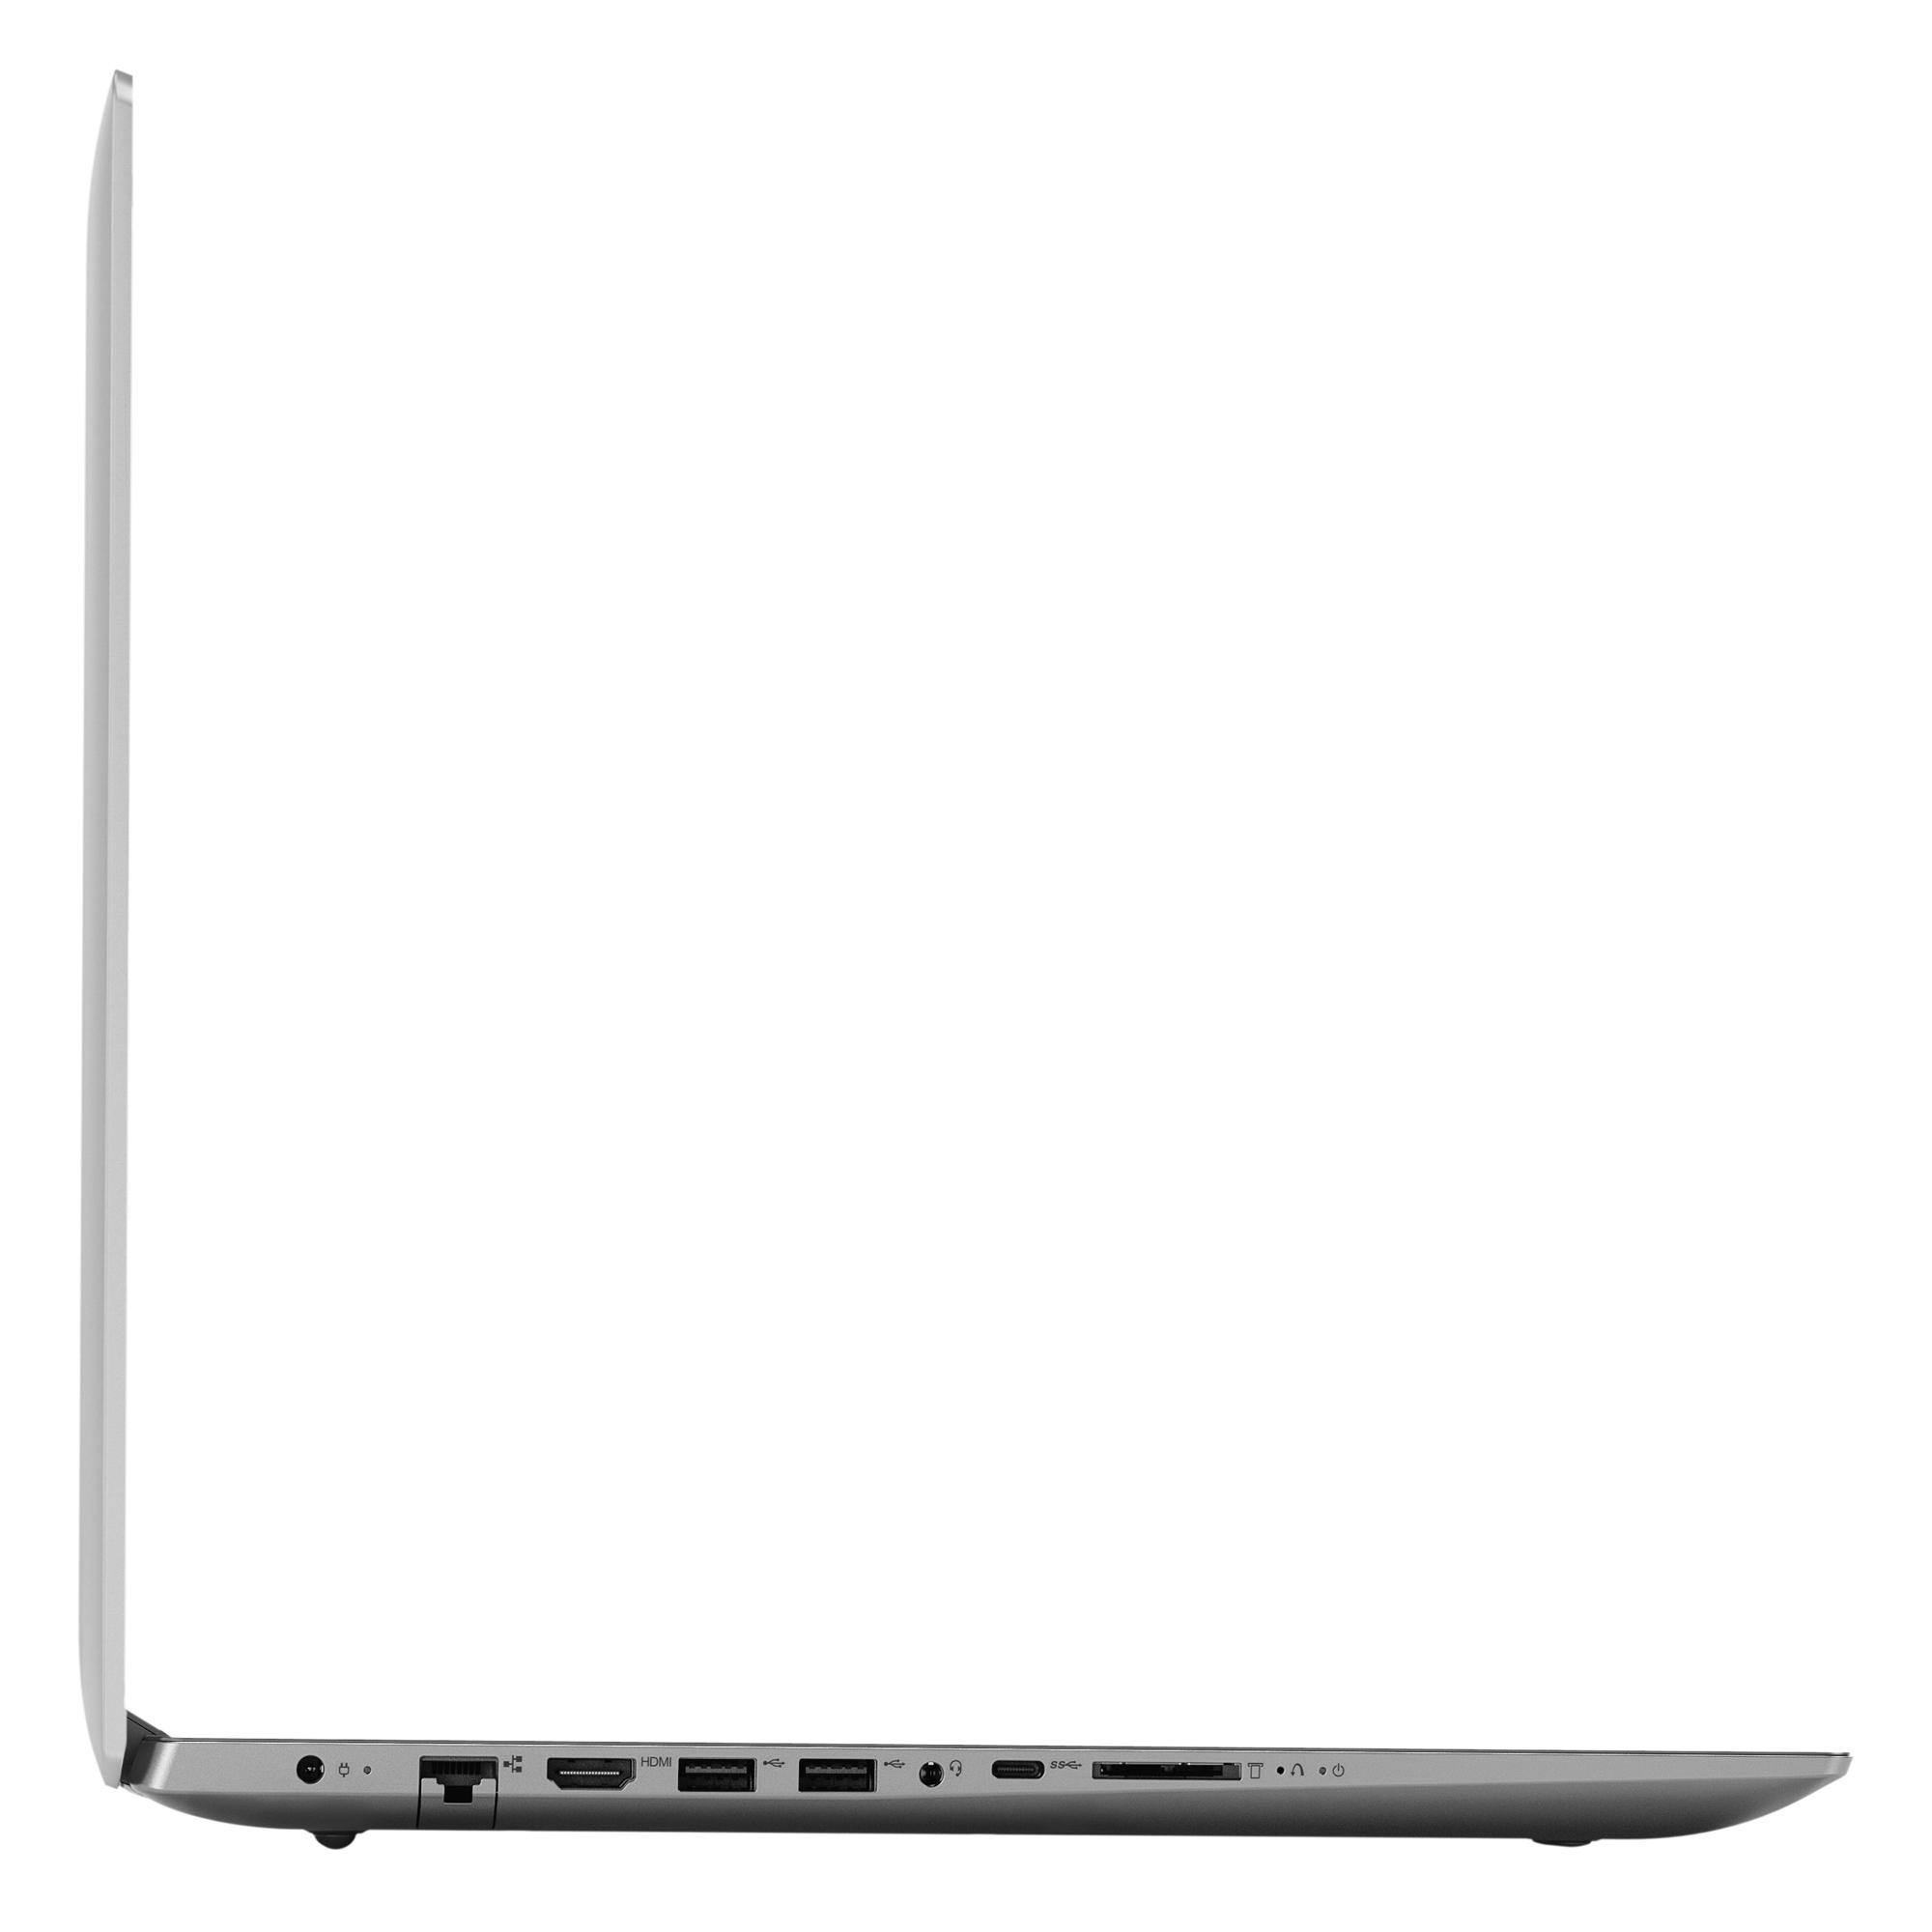 Фото  Ноутбук Lenovo ideapad 330-17IKBR Platinum Grey (81DM007FRA)